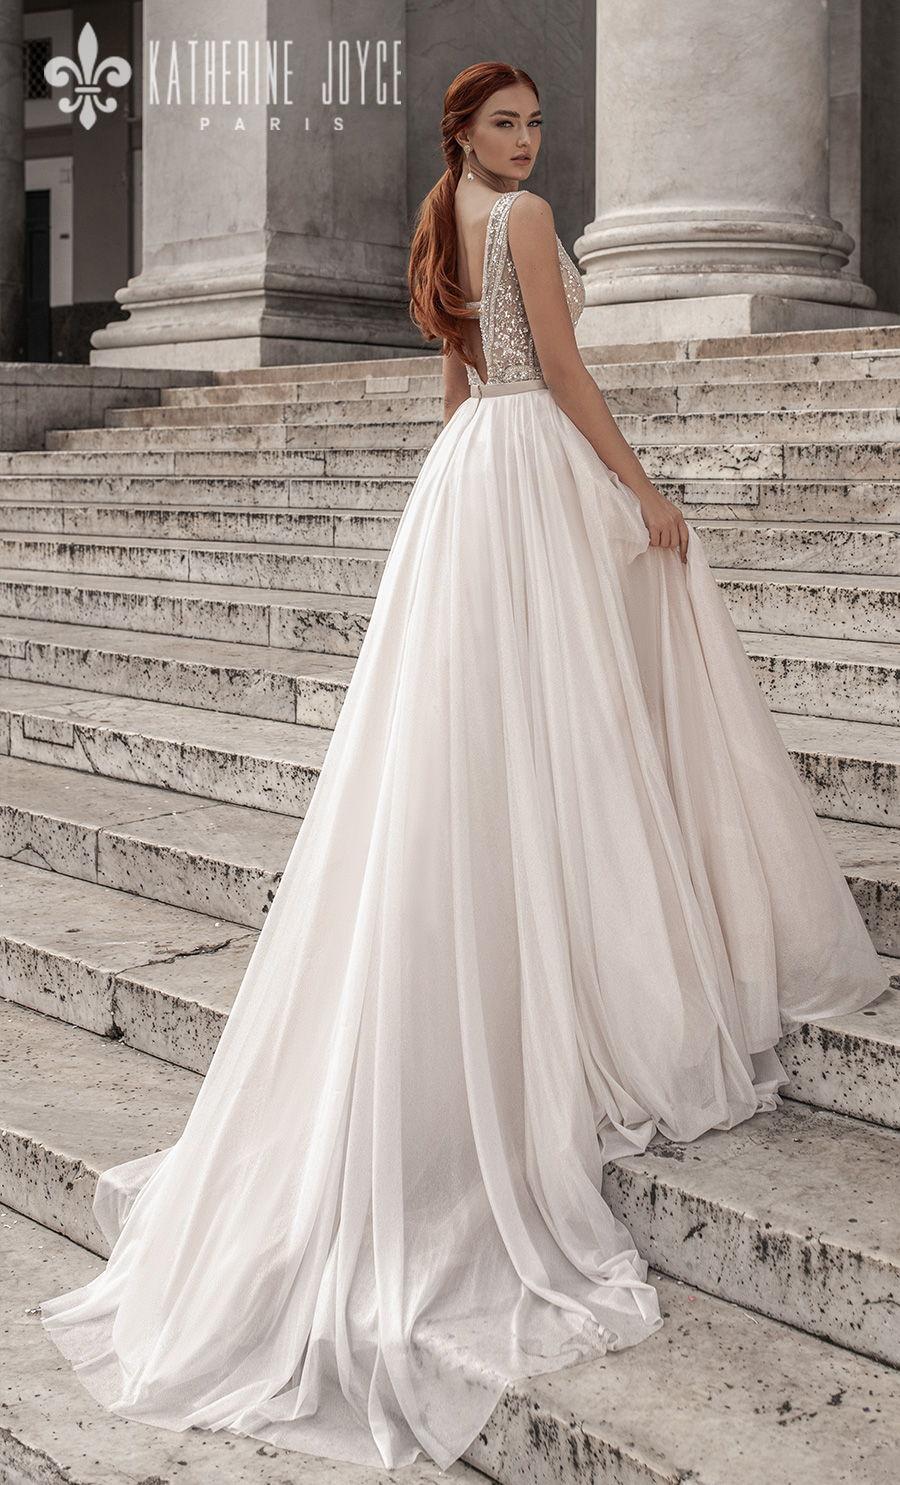 katherine joyce 2021 naples bridal sleeveless deep v neck heavily embellished bodice romantic a line wedding dress v back chapel train (calipso) bv